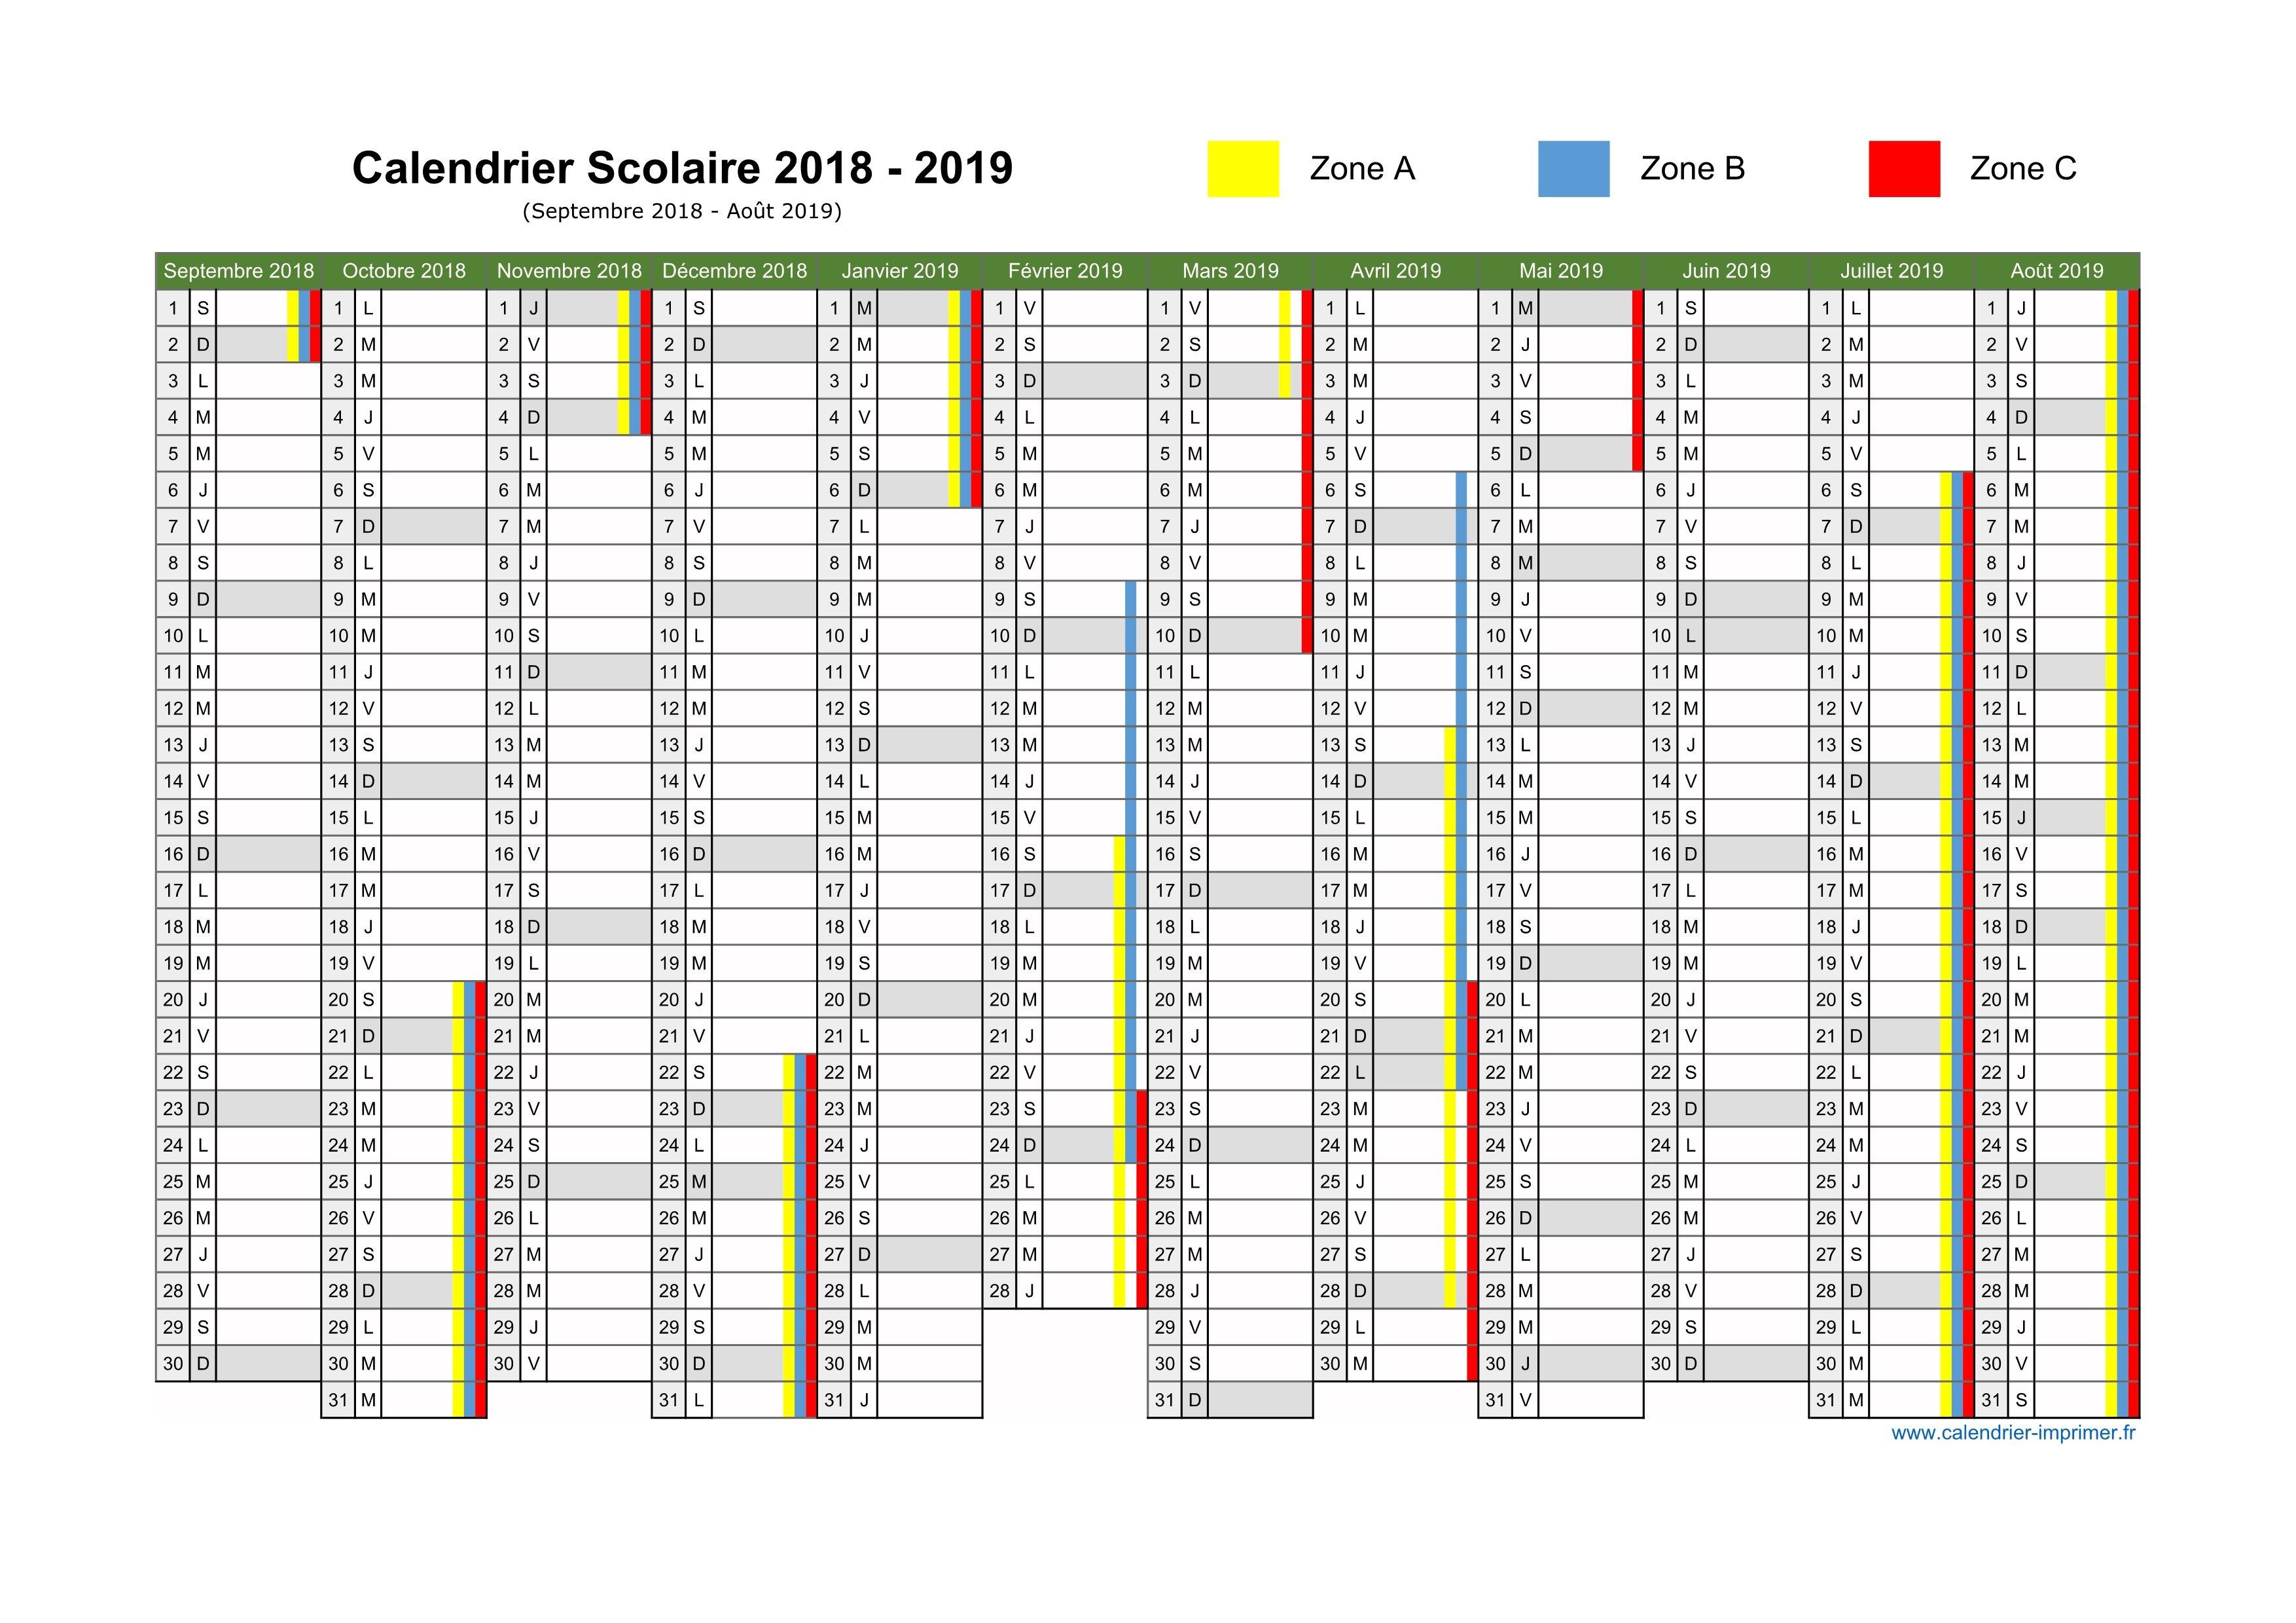 Calendrier Scolaire 2019 2020 Excel.Telecharger Calendrier Scolaire 2018 2019 Pdf Pdf